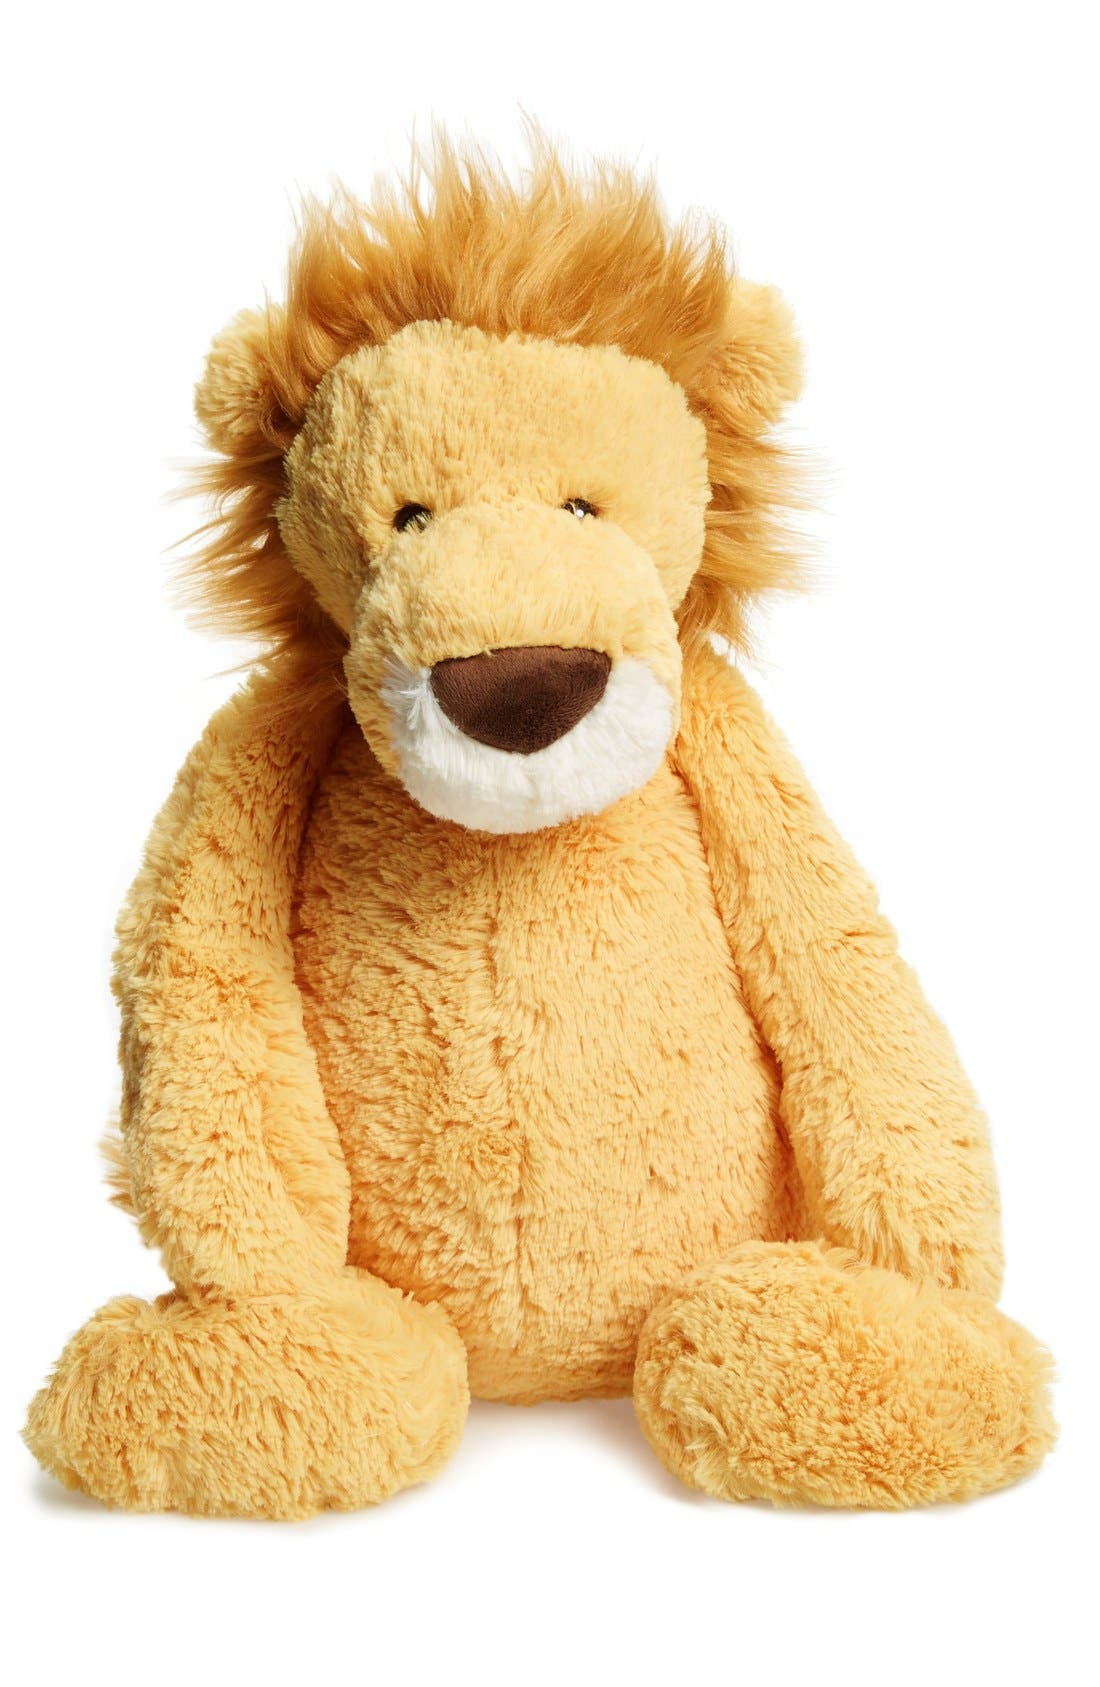 Huge Bashful Lion Stuffed Animal,                         Main,                         color, Yellow